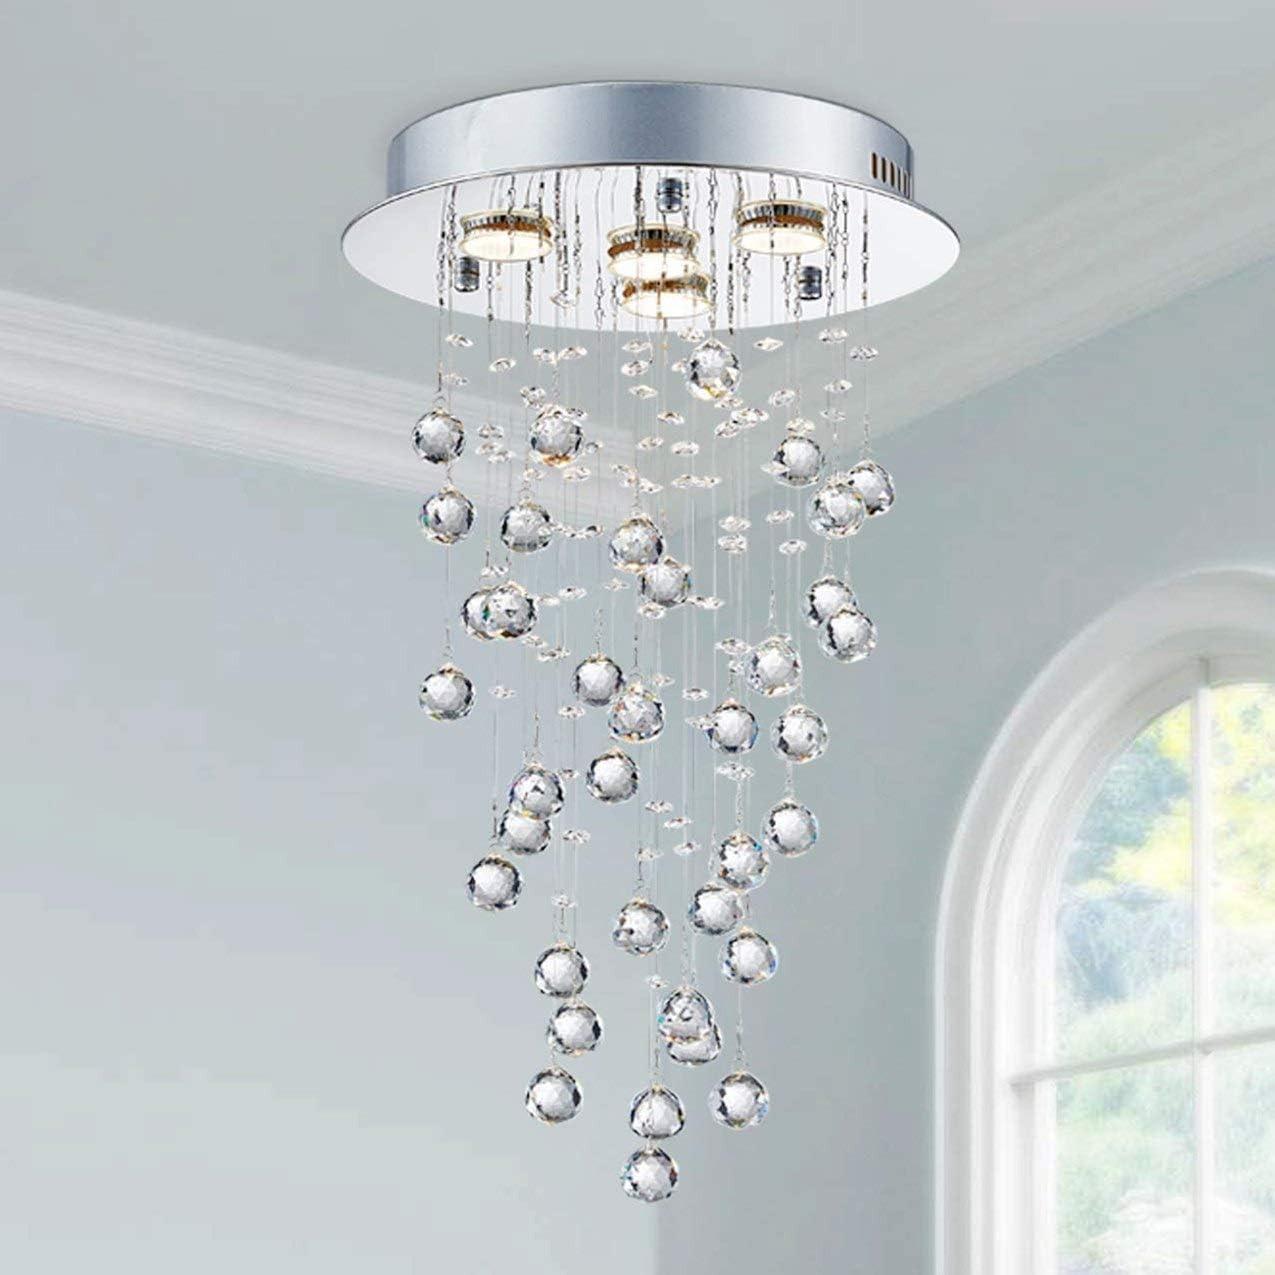 Saint Mossi Modern Crystal Chandelier Lighting,Rain Drop K9 Crystal Glass Chandelier, 4-Light Flush Mount Ceiling Chandelier